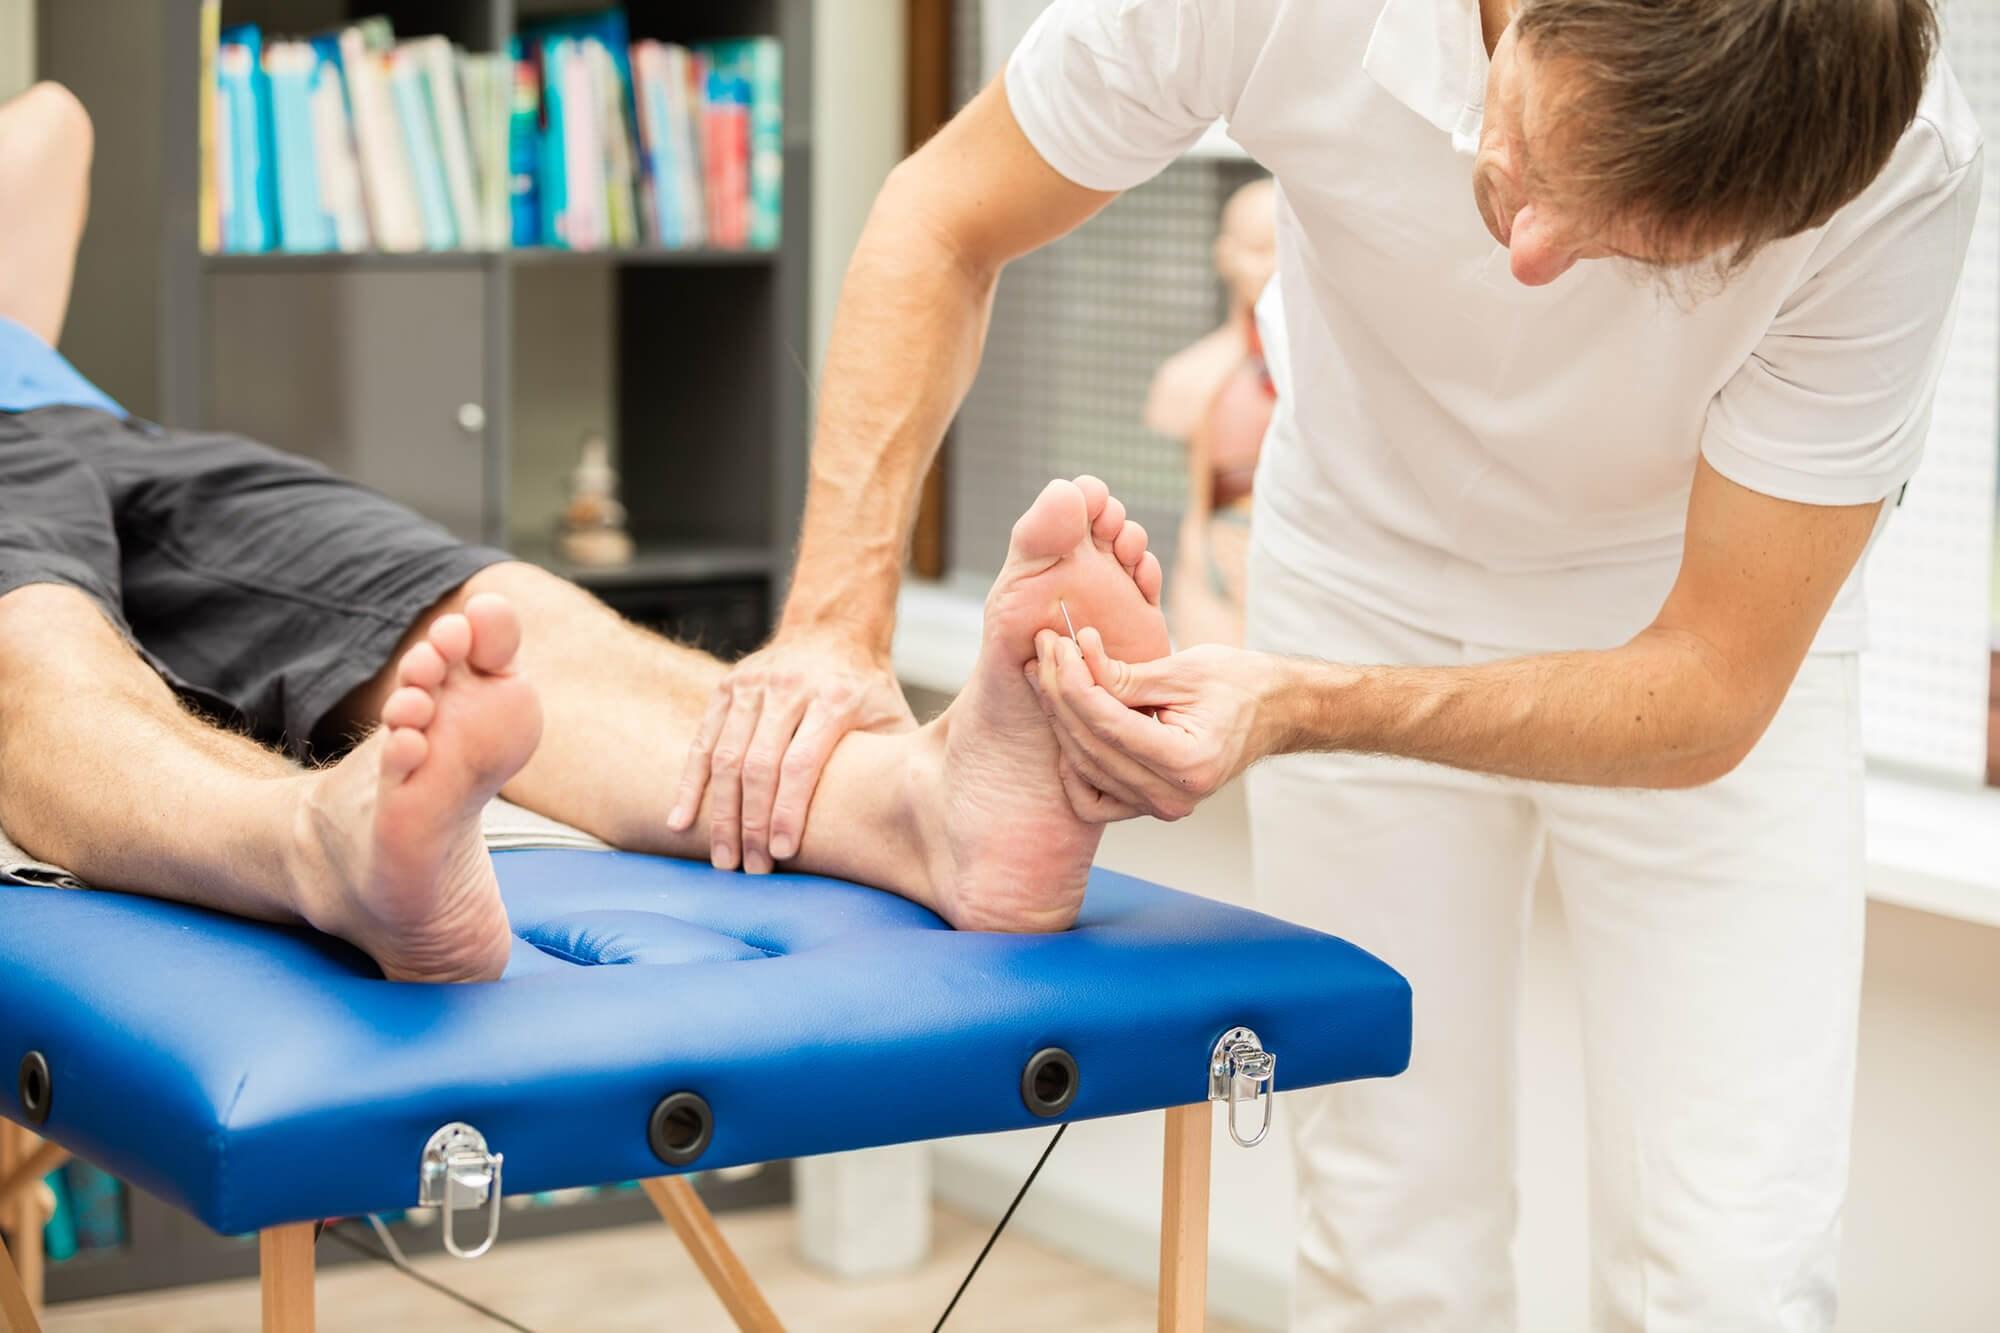 Oncologist Interpretations of CIPN Symptoms Show Disconnect With Patient Reports